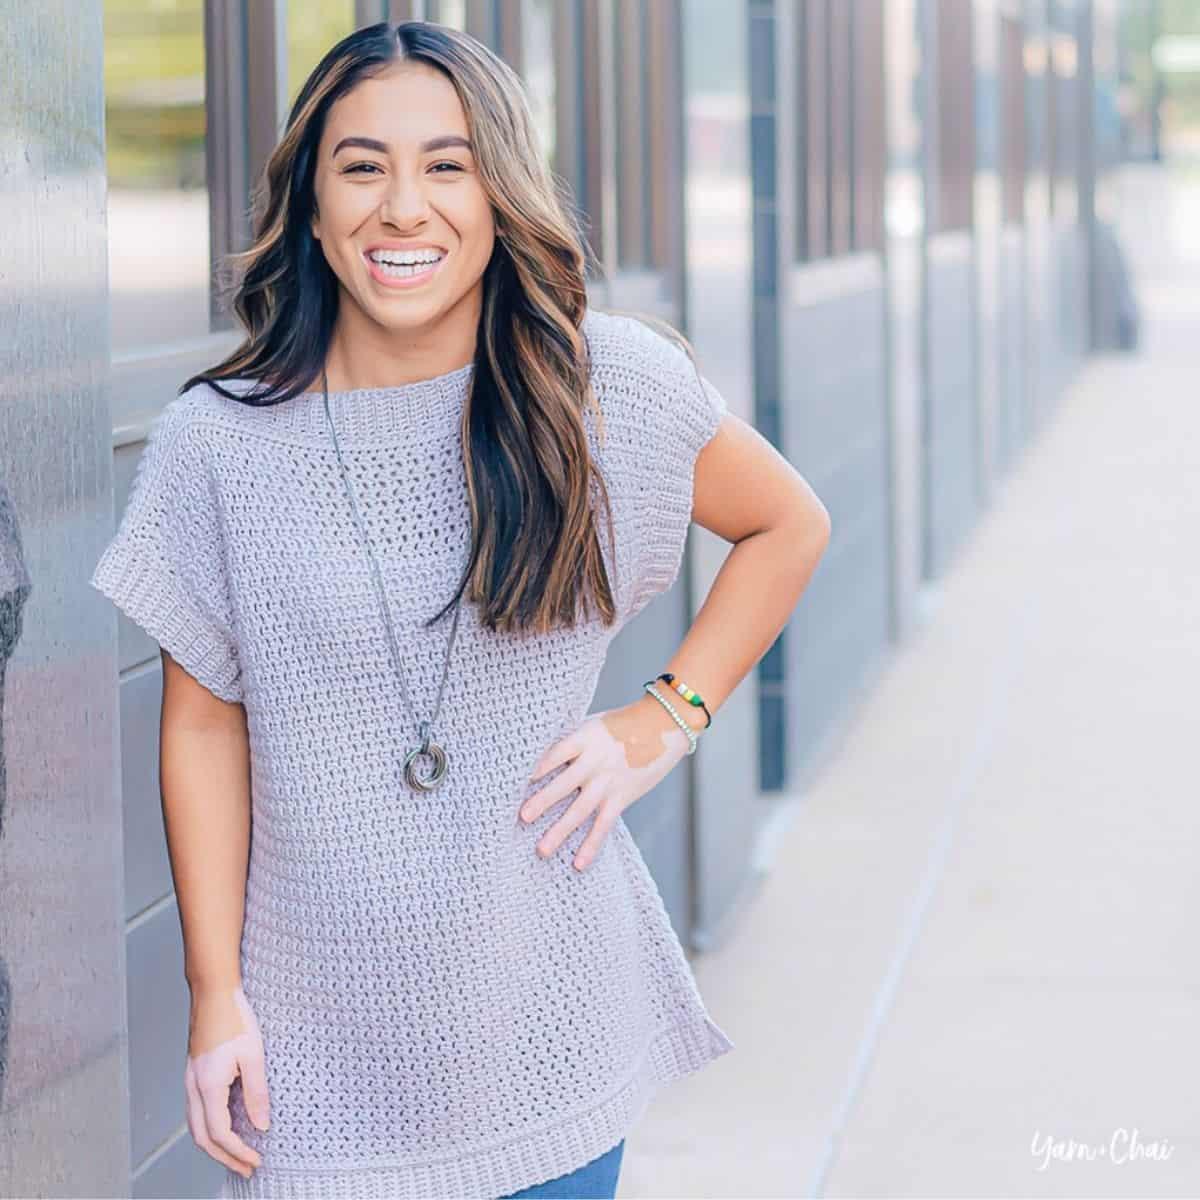 woman wearing a gray crochet top